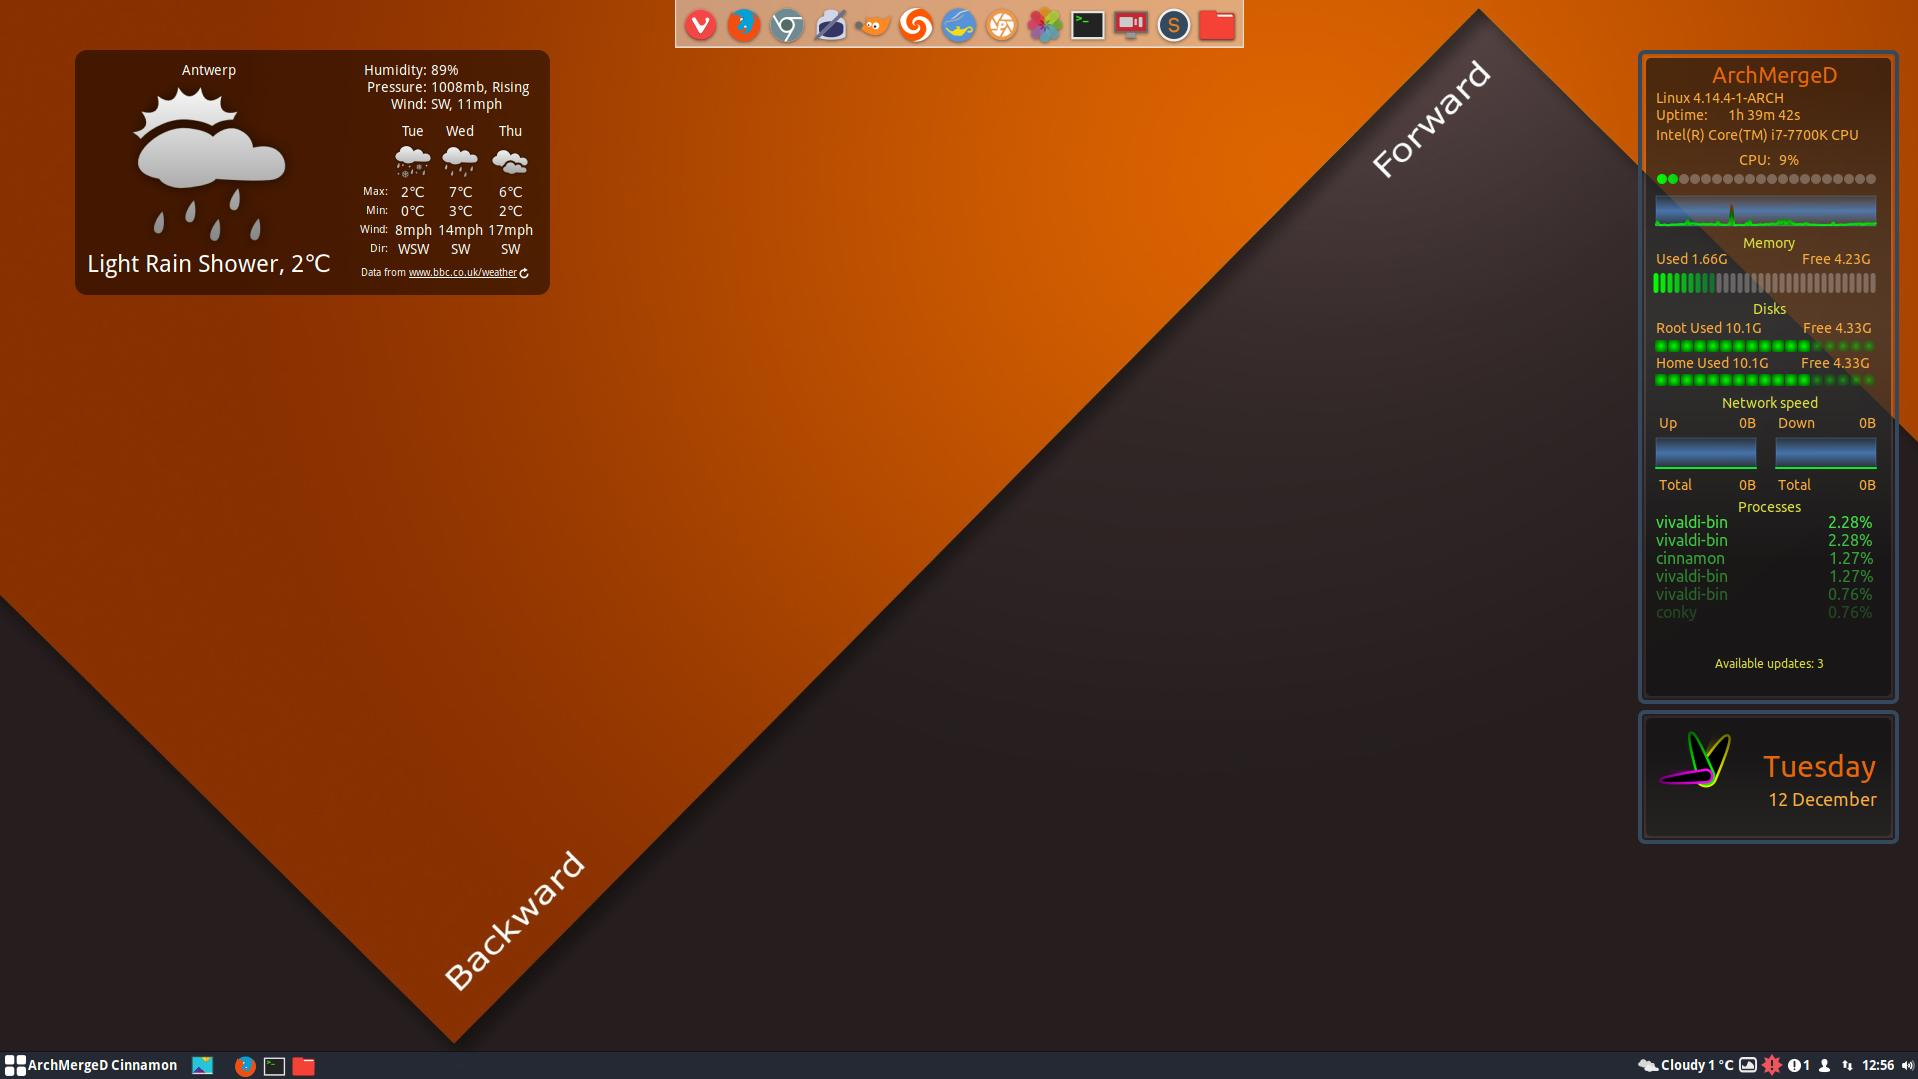 ArchMergeD Kirk Release 6.3